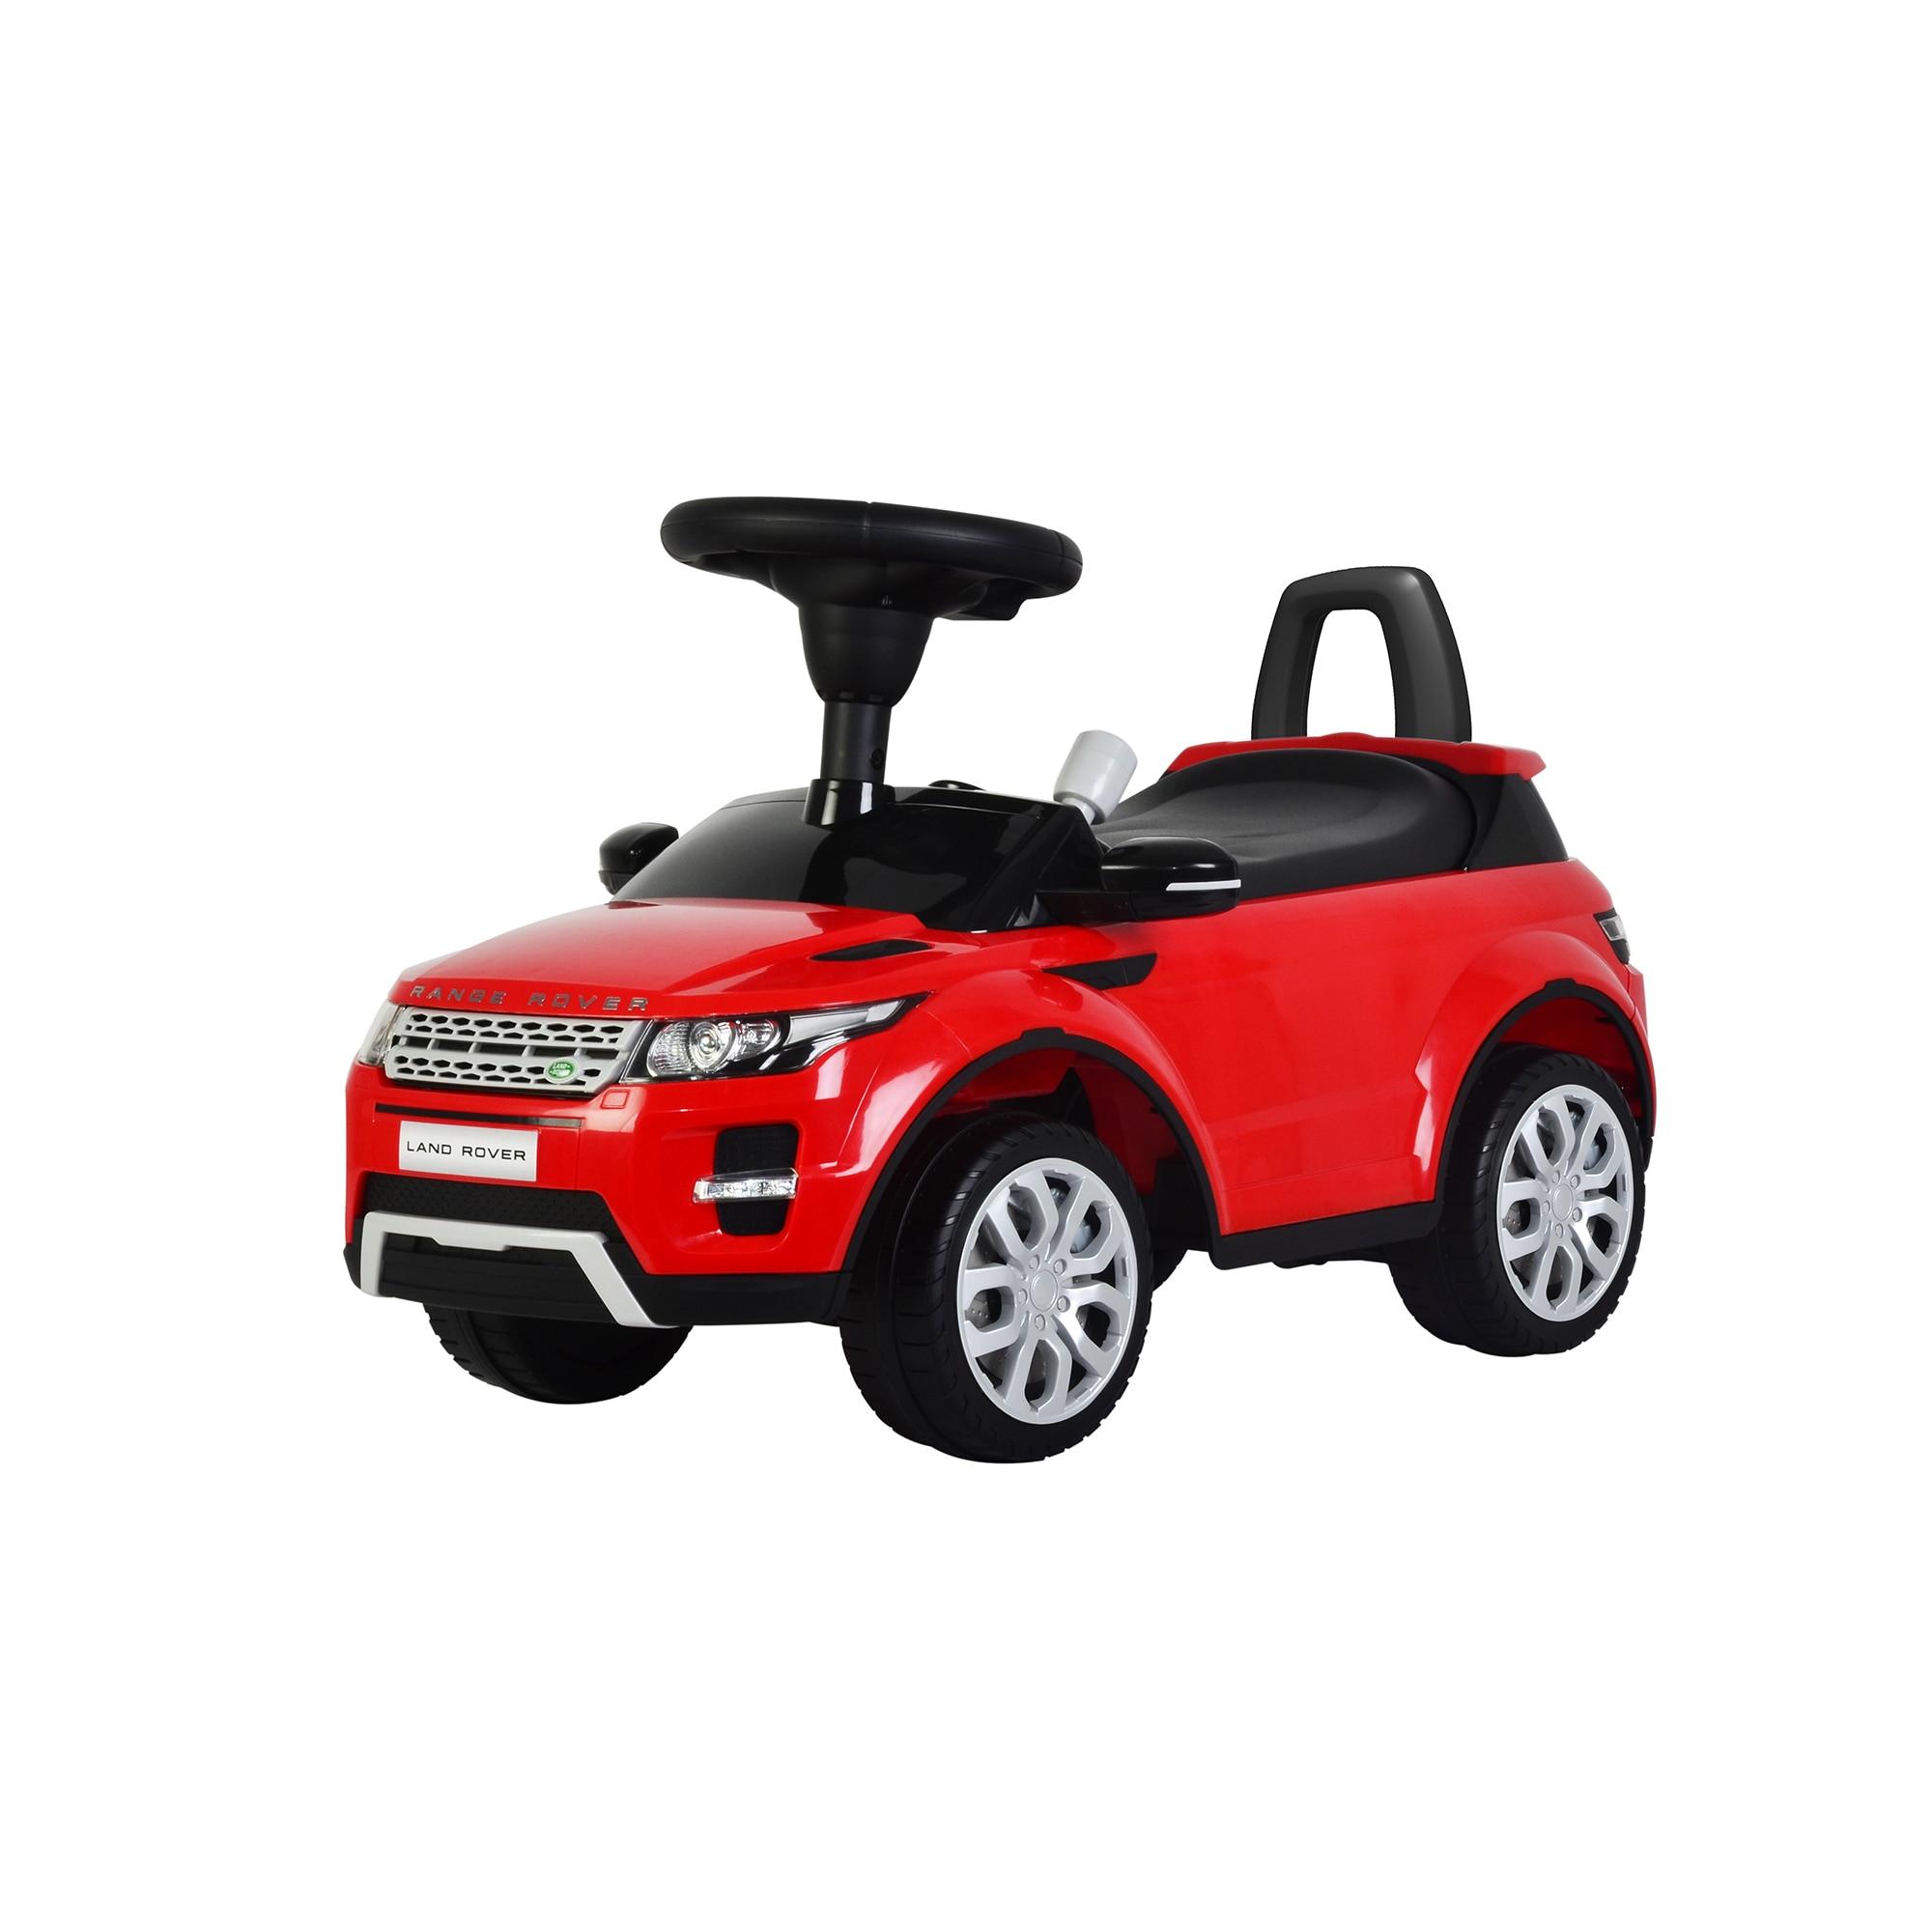 Fotografie Masinuta Ride-on Mappy - Land Rover, Rosu